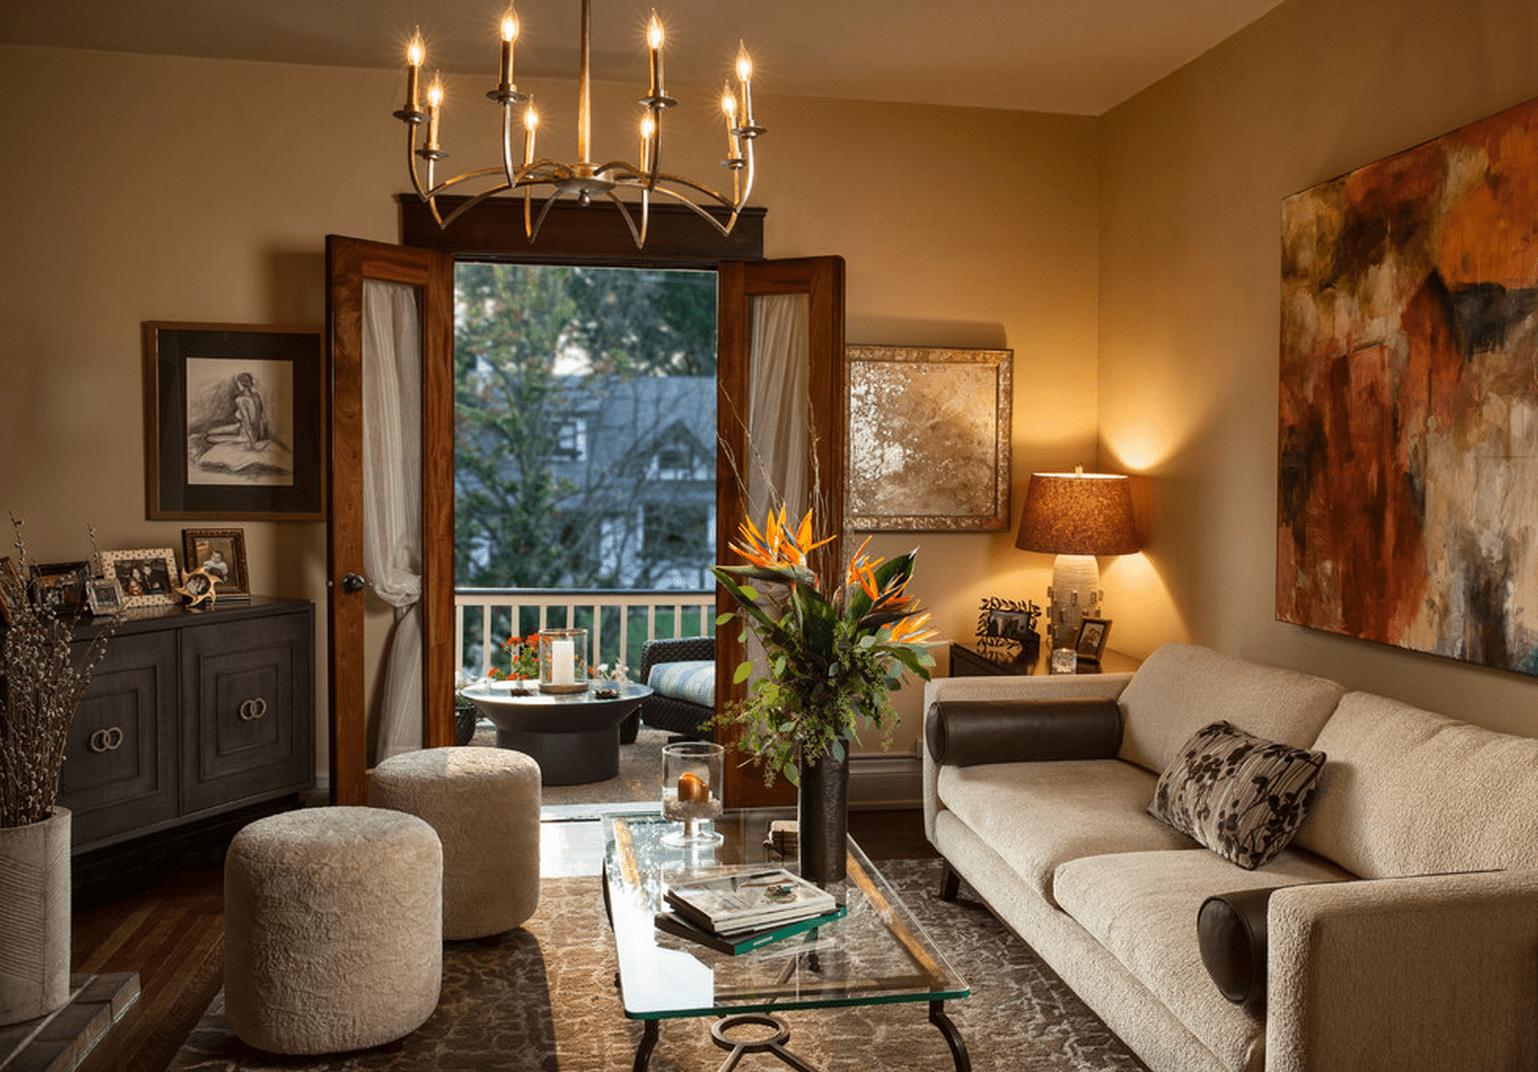 cozy decorating ideas for living rooms.  21 Cozy Living Room Design Ideas